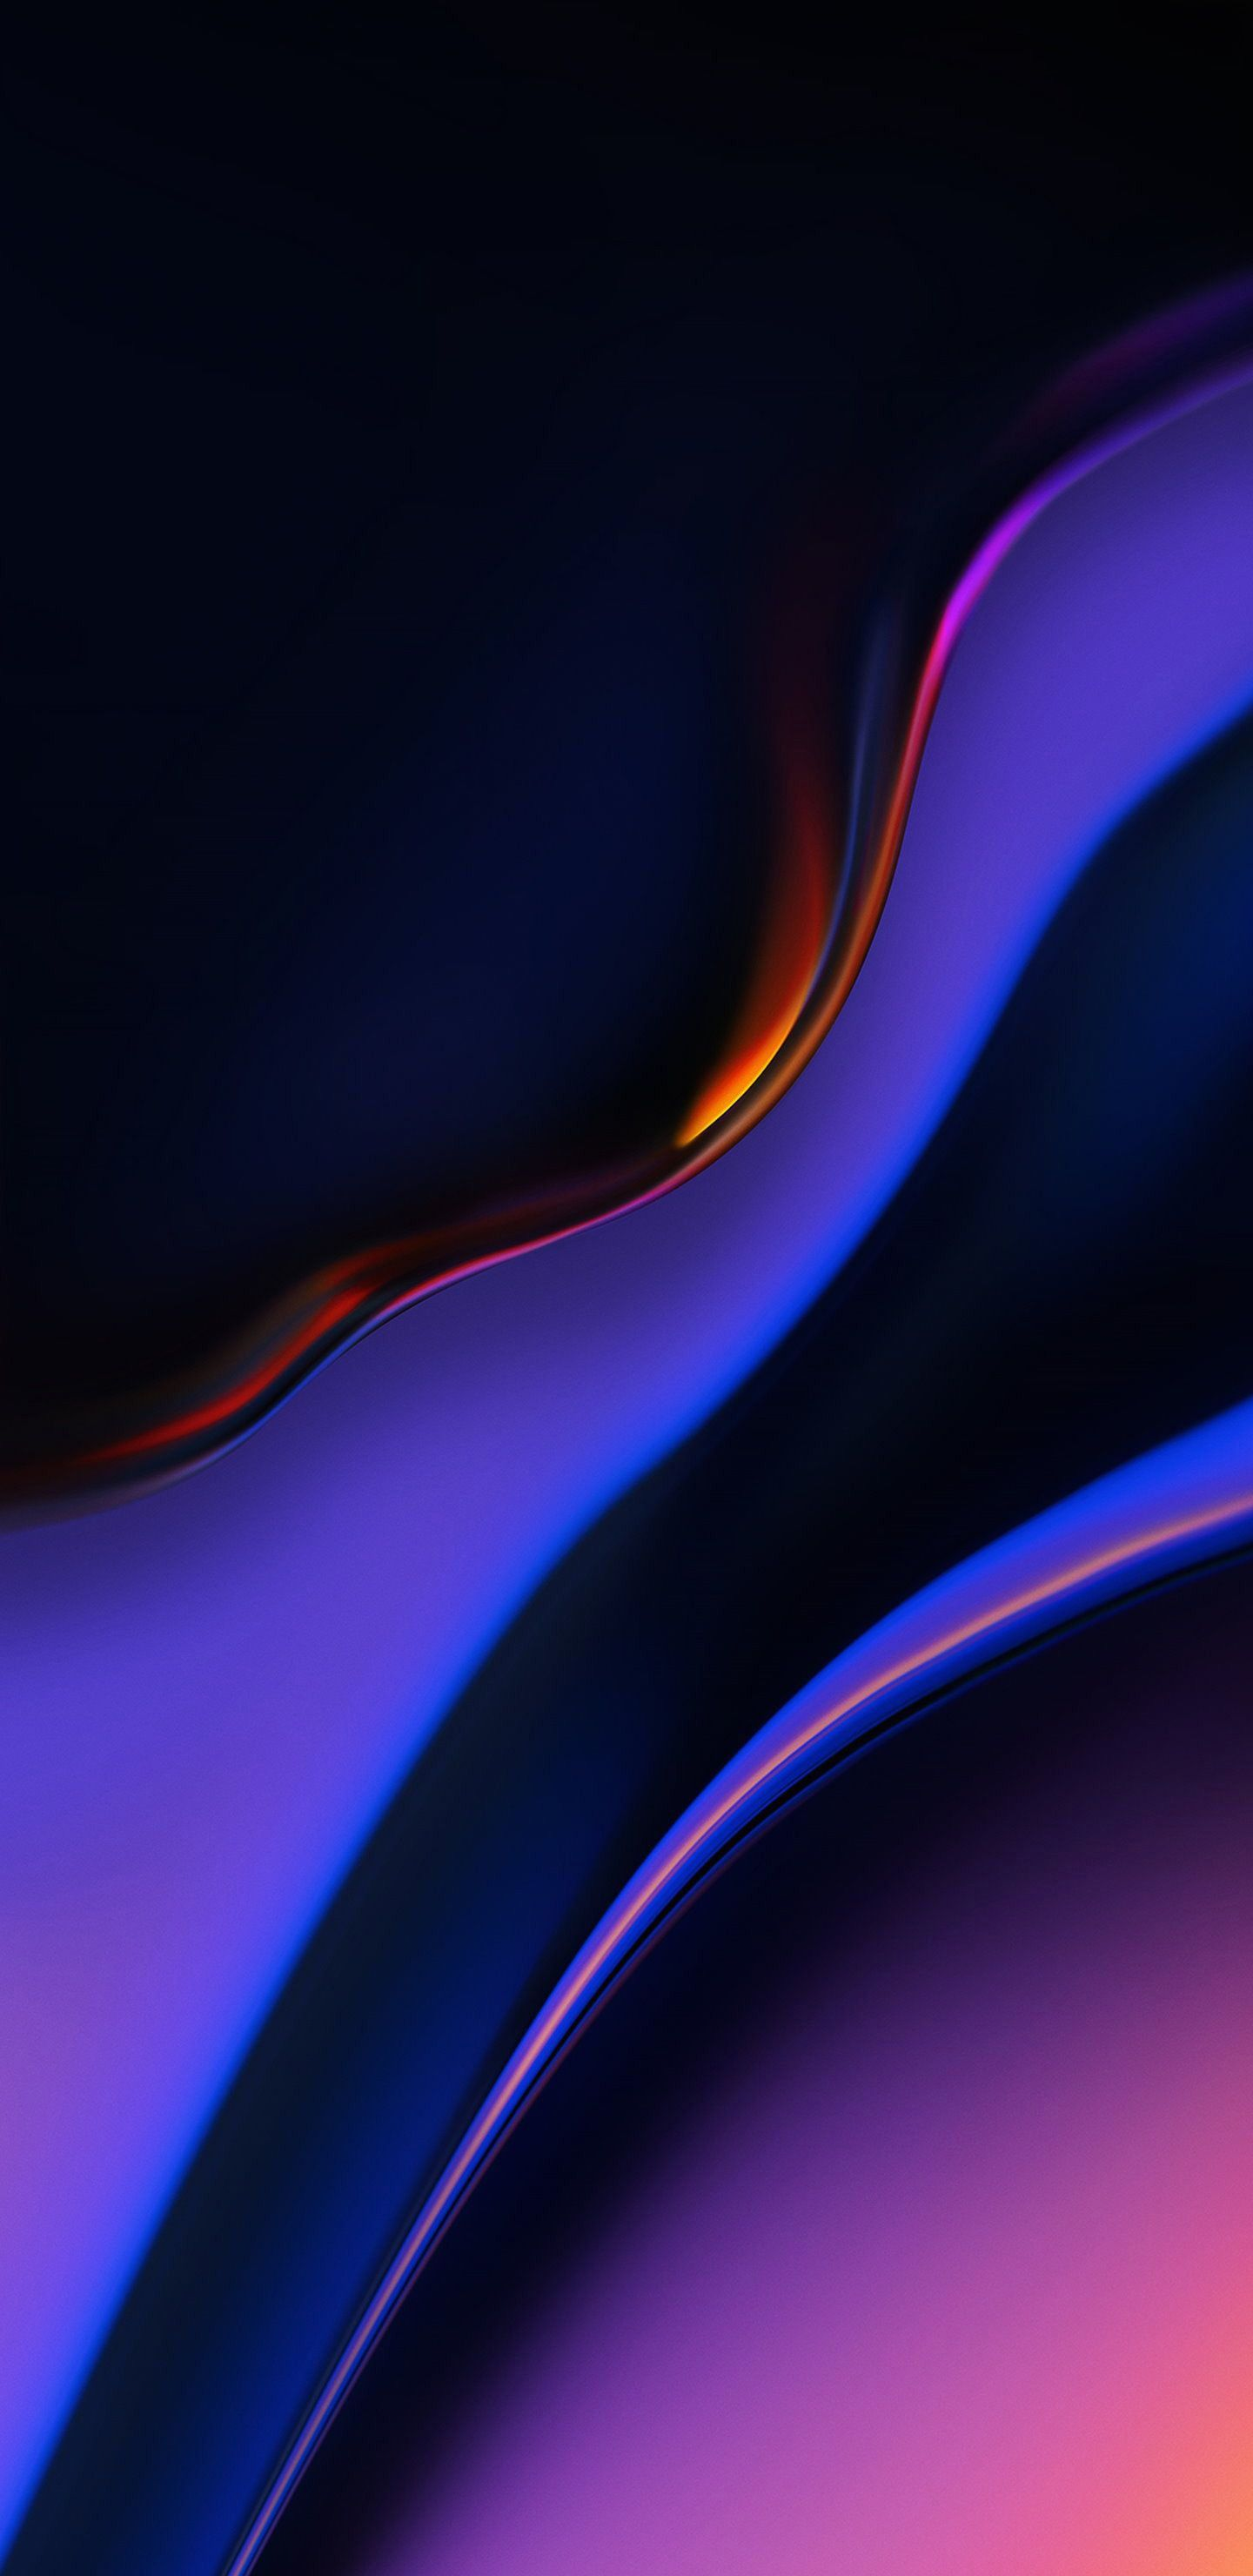 Hintergrundbilder Samsung Galaxy, 2020 Galaxy wallpaper